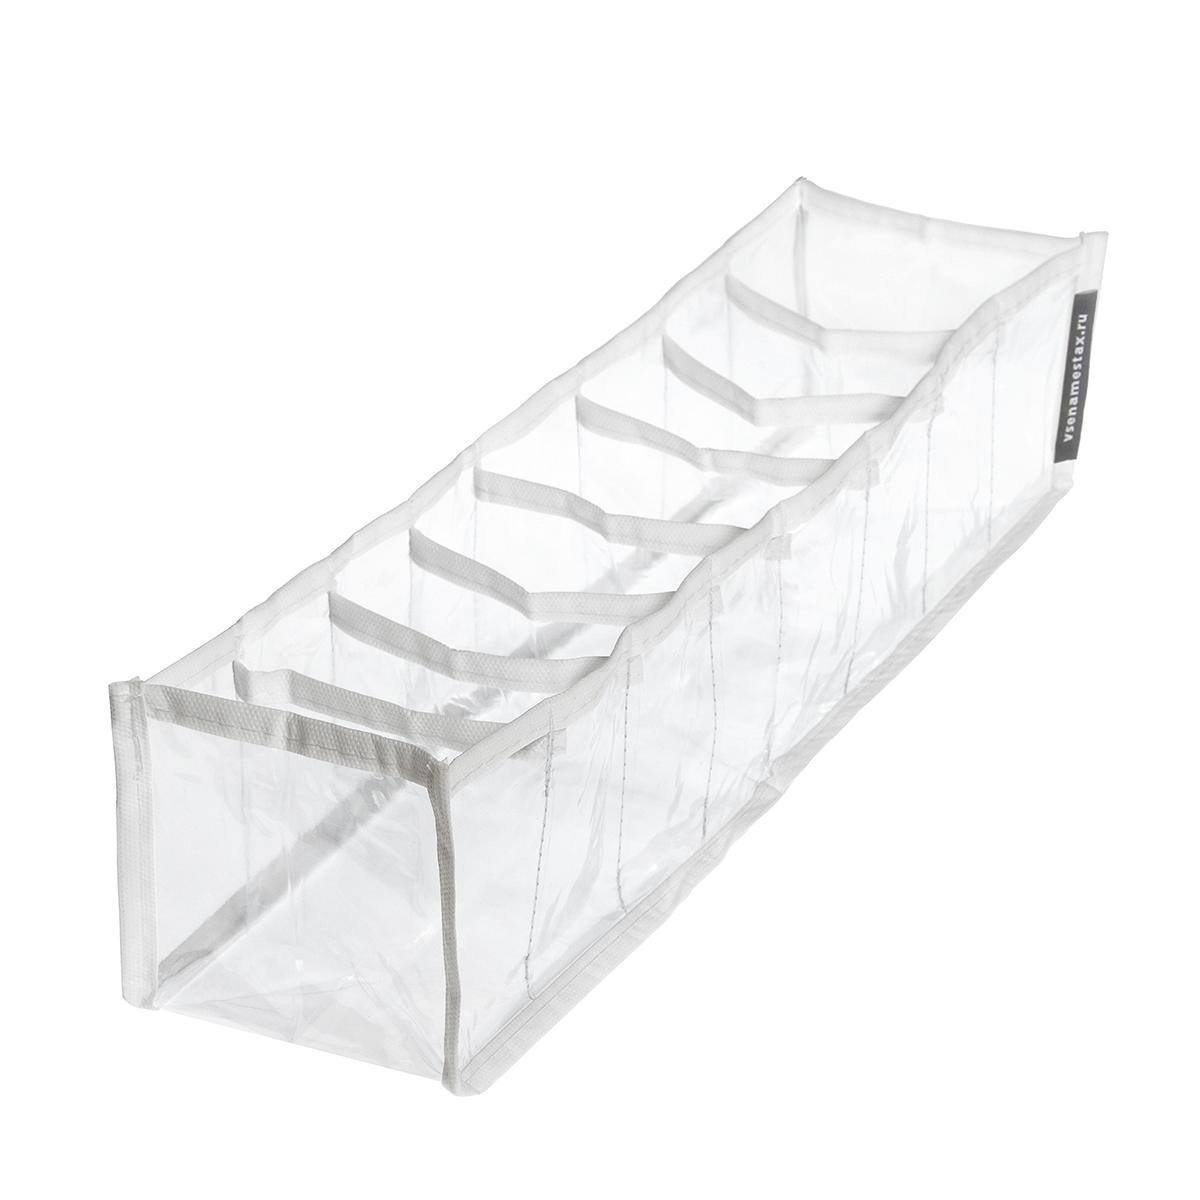 Органайзер прозрачный 40х10х10 см, 8 ячеек, Белый